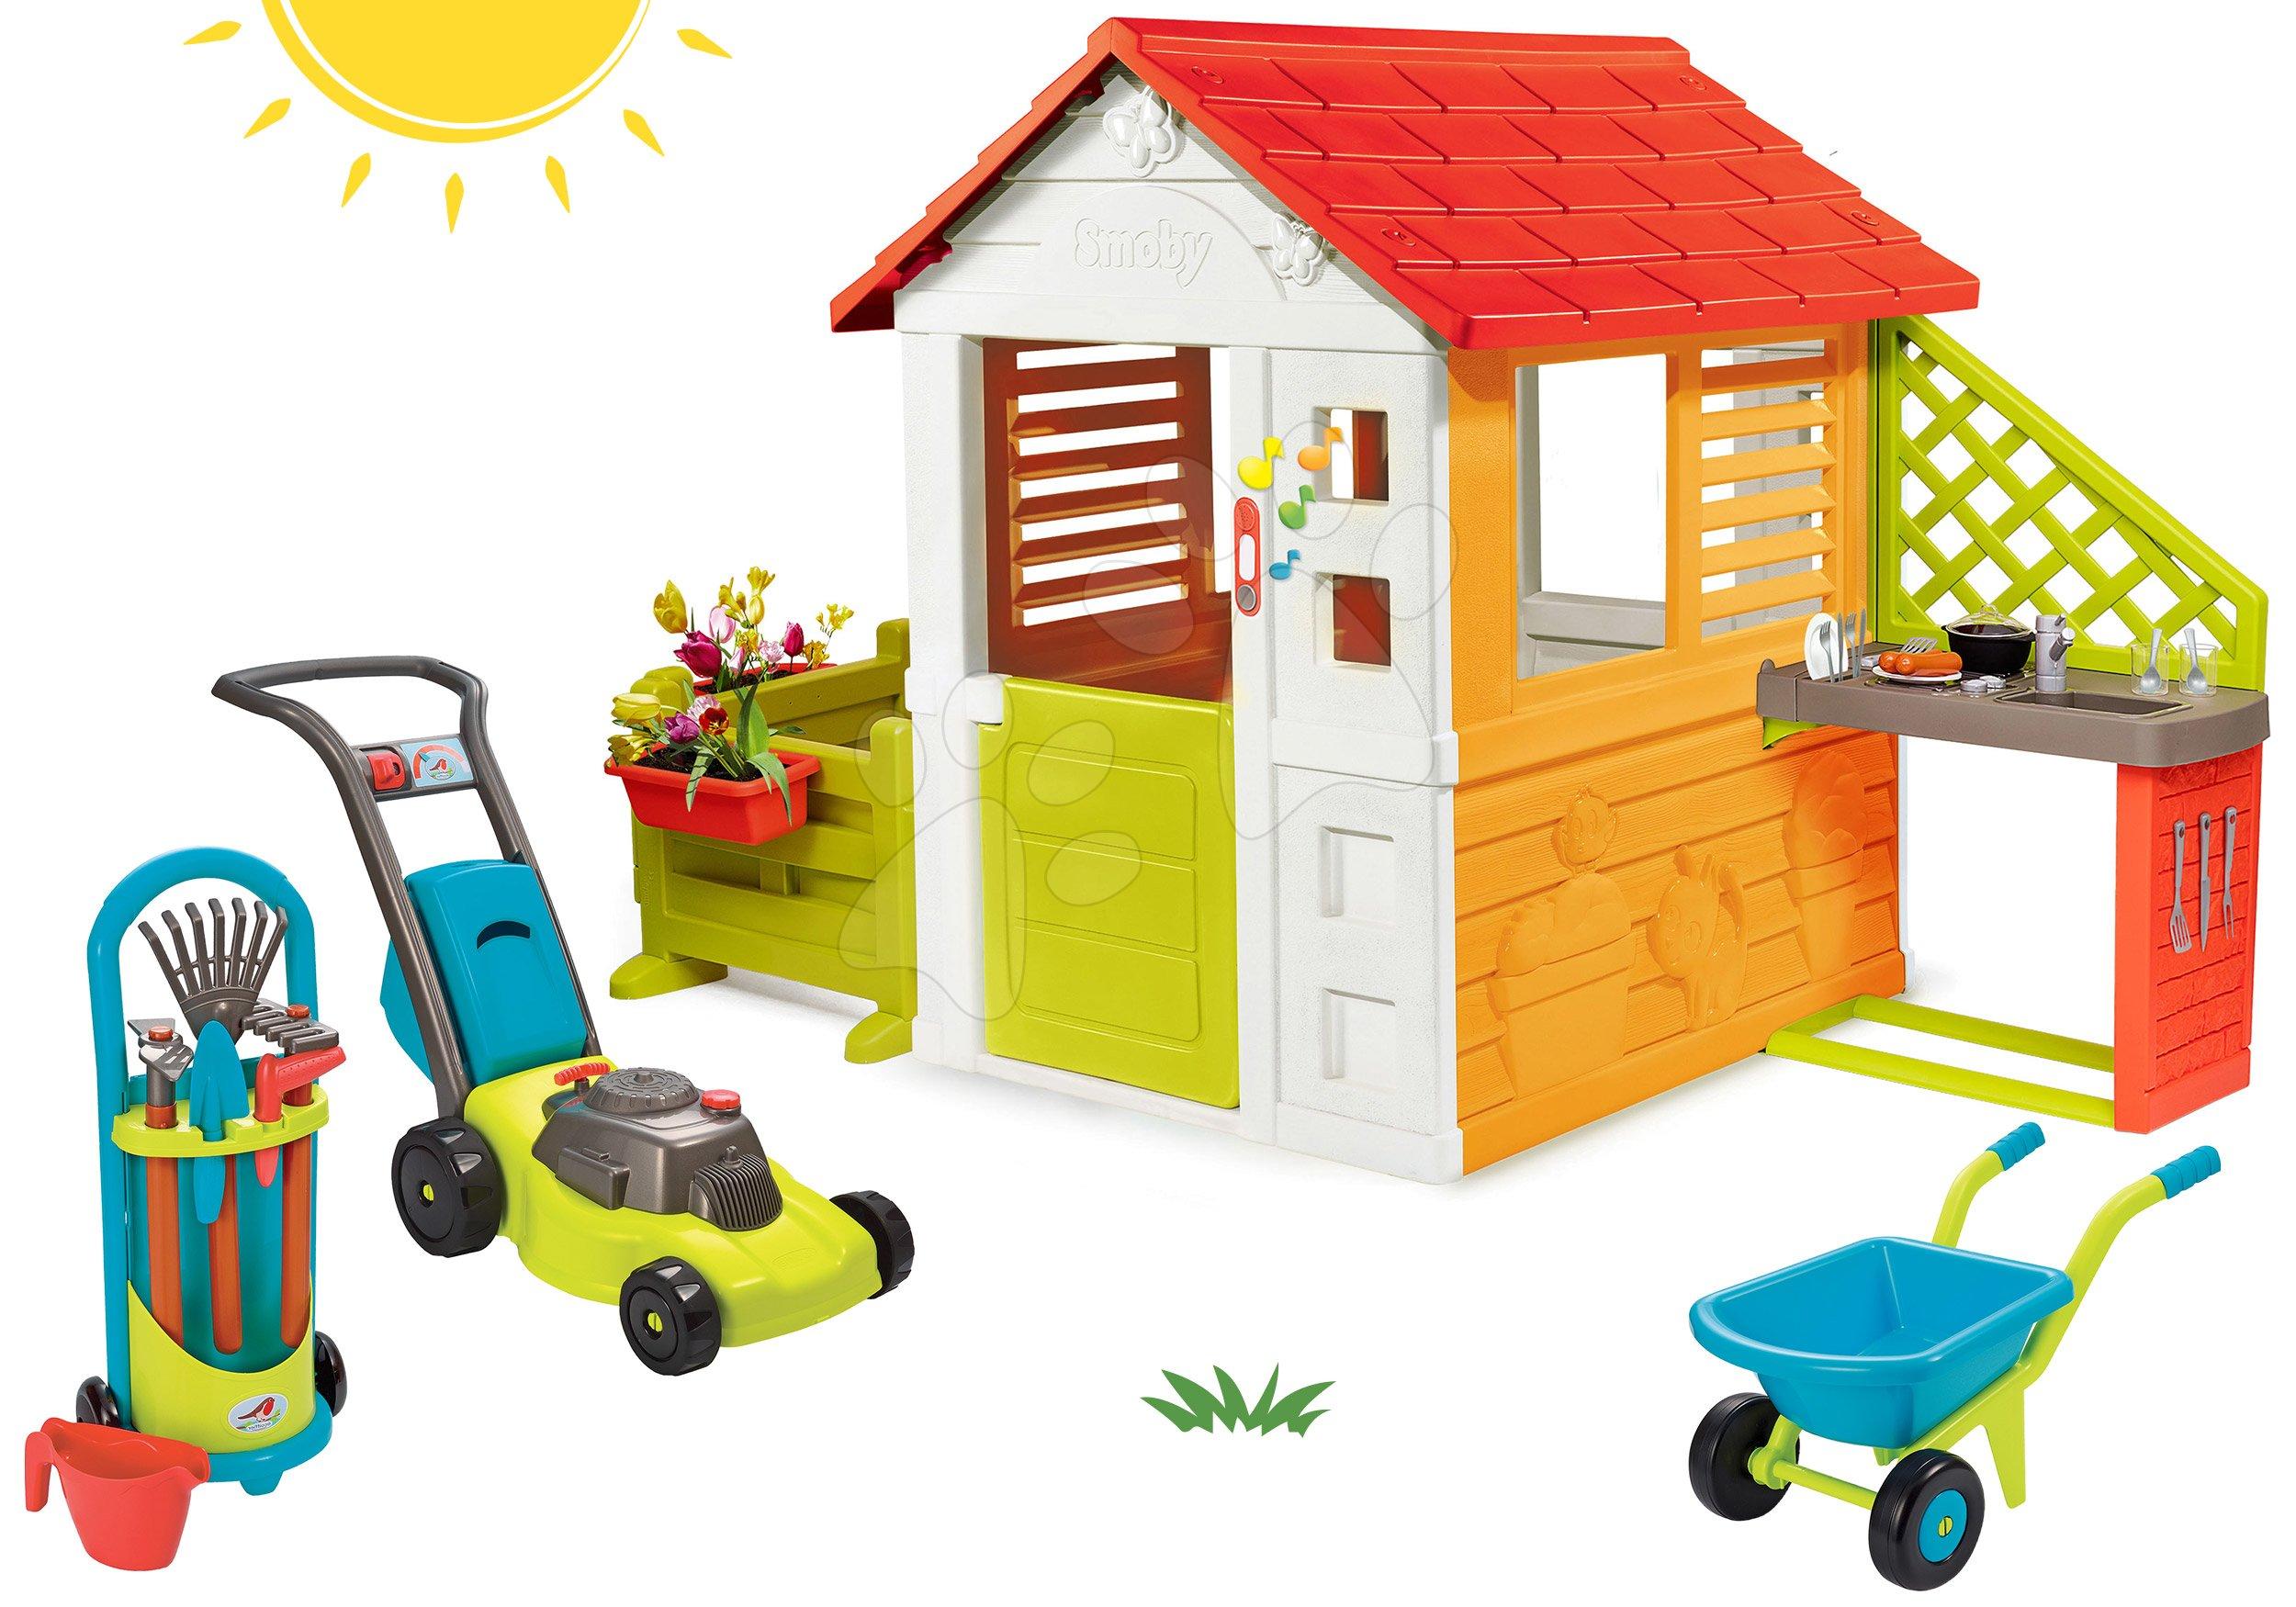 Set domček Slniečko Sunny Smoby s kuchynkou a záhradka s pracovným náradím